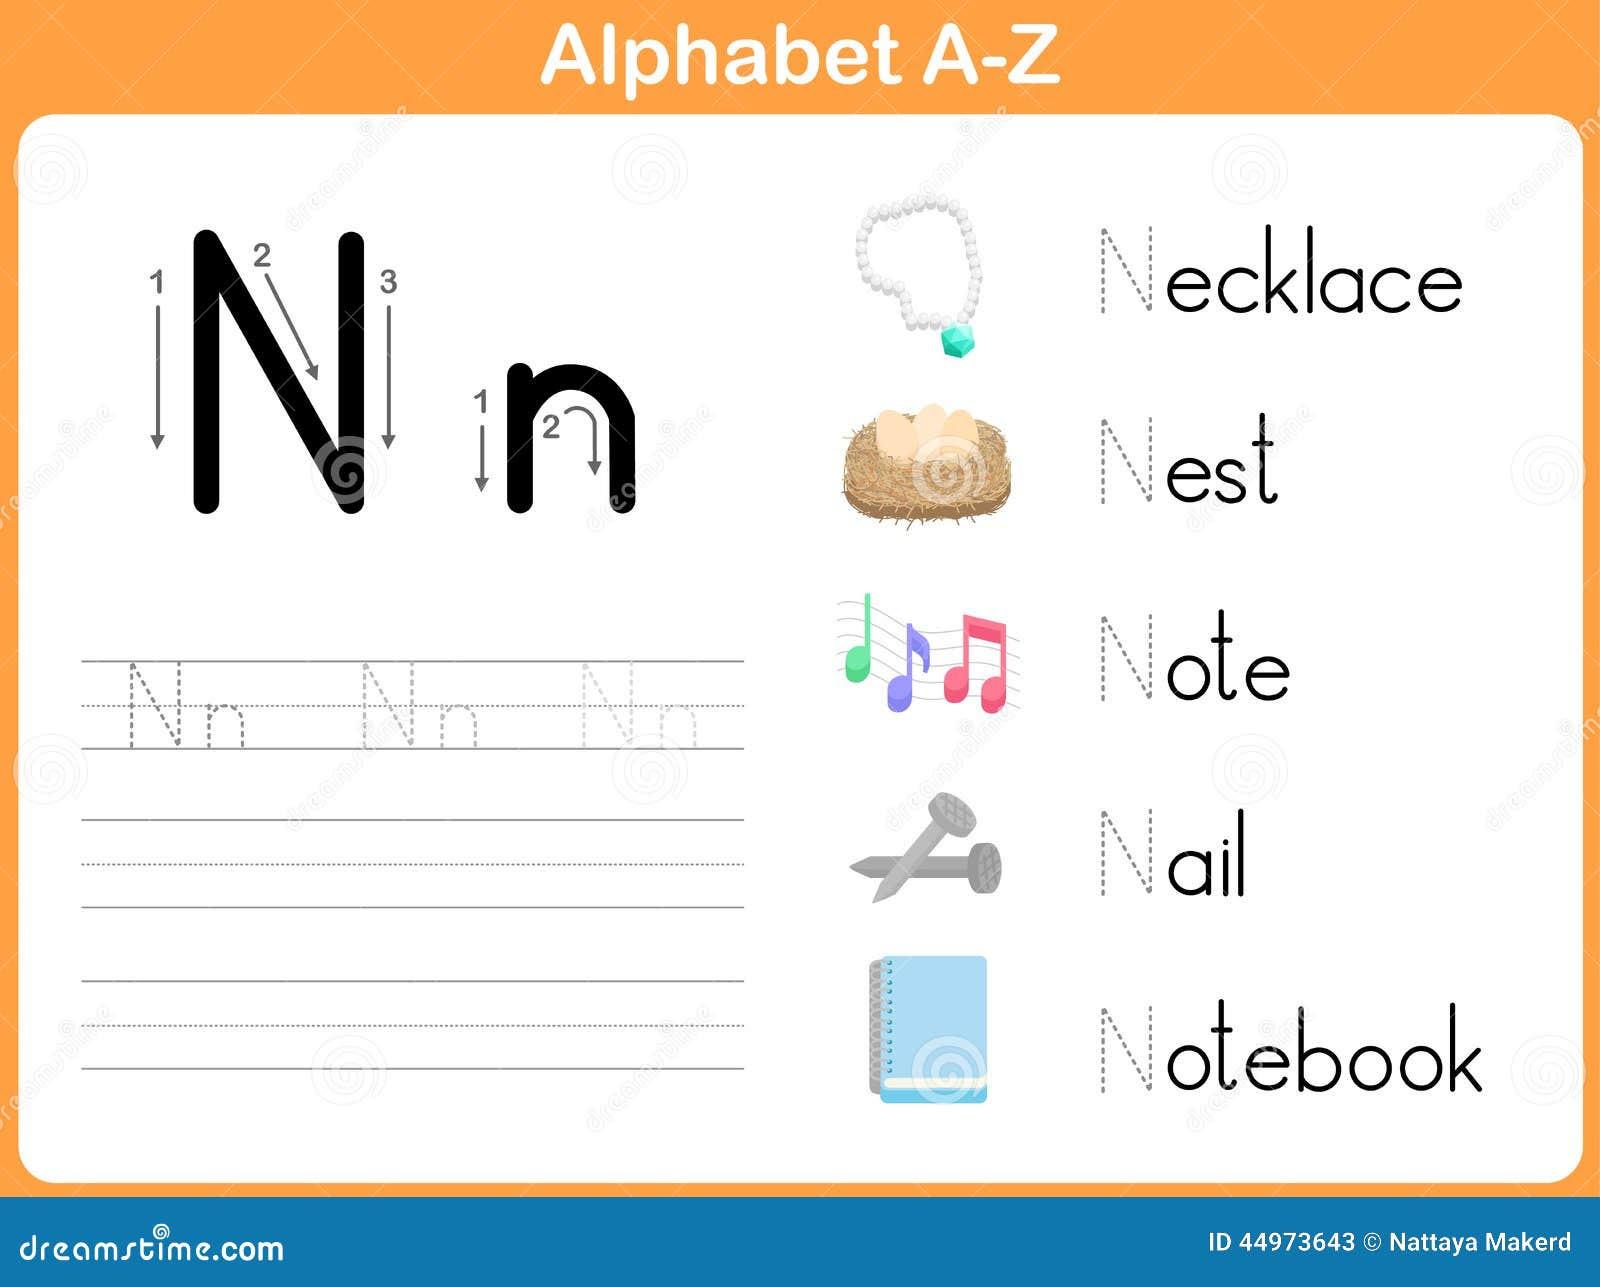 Printable Alphabet Tracing Worksheets A Z - Calendar June